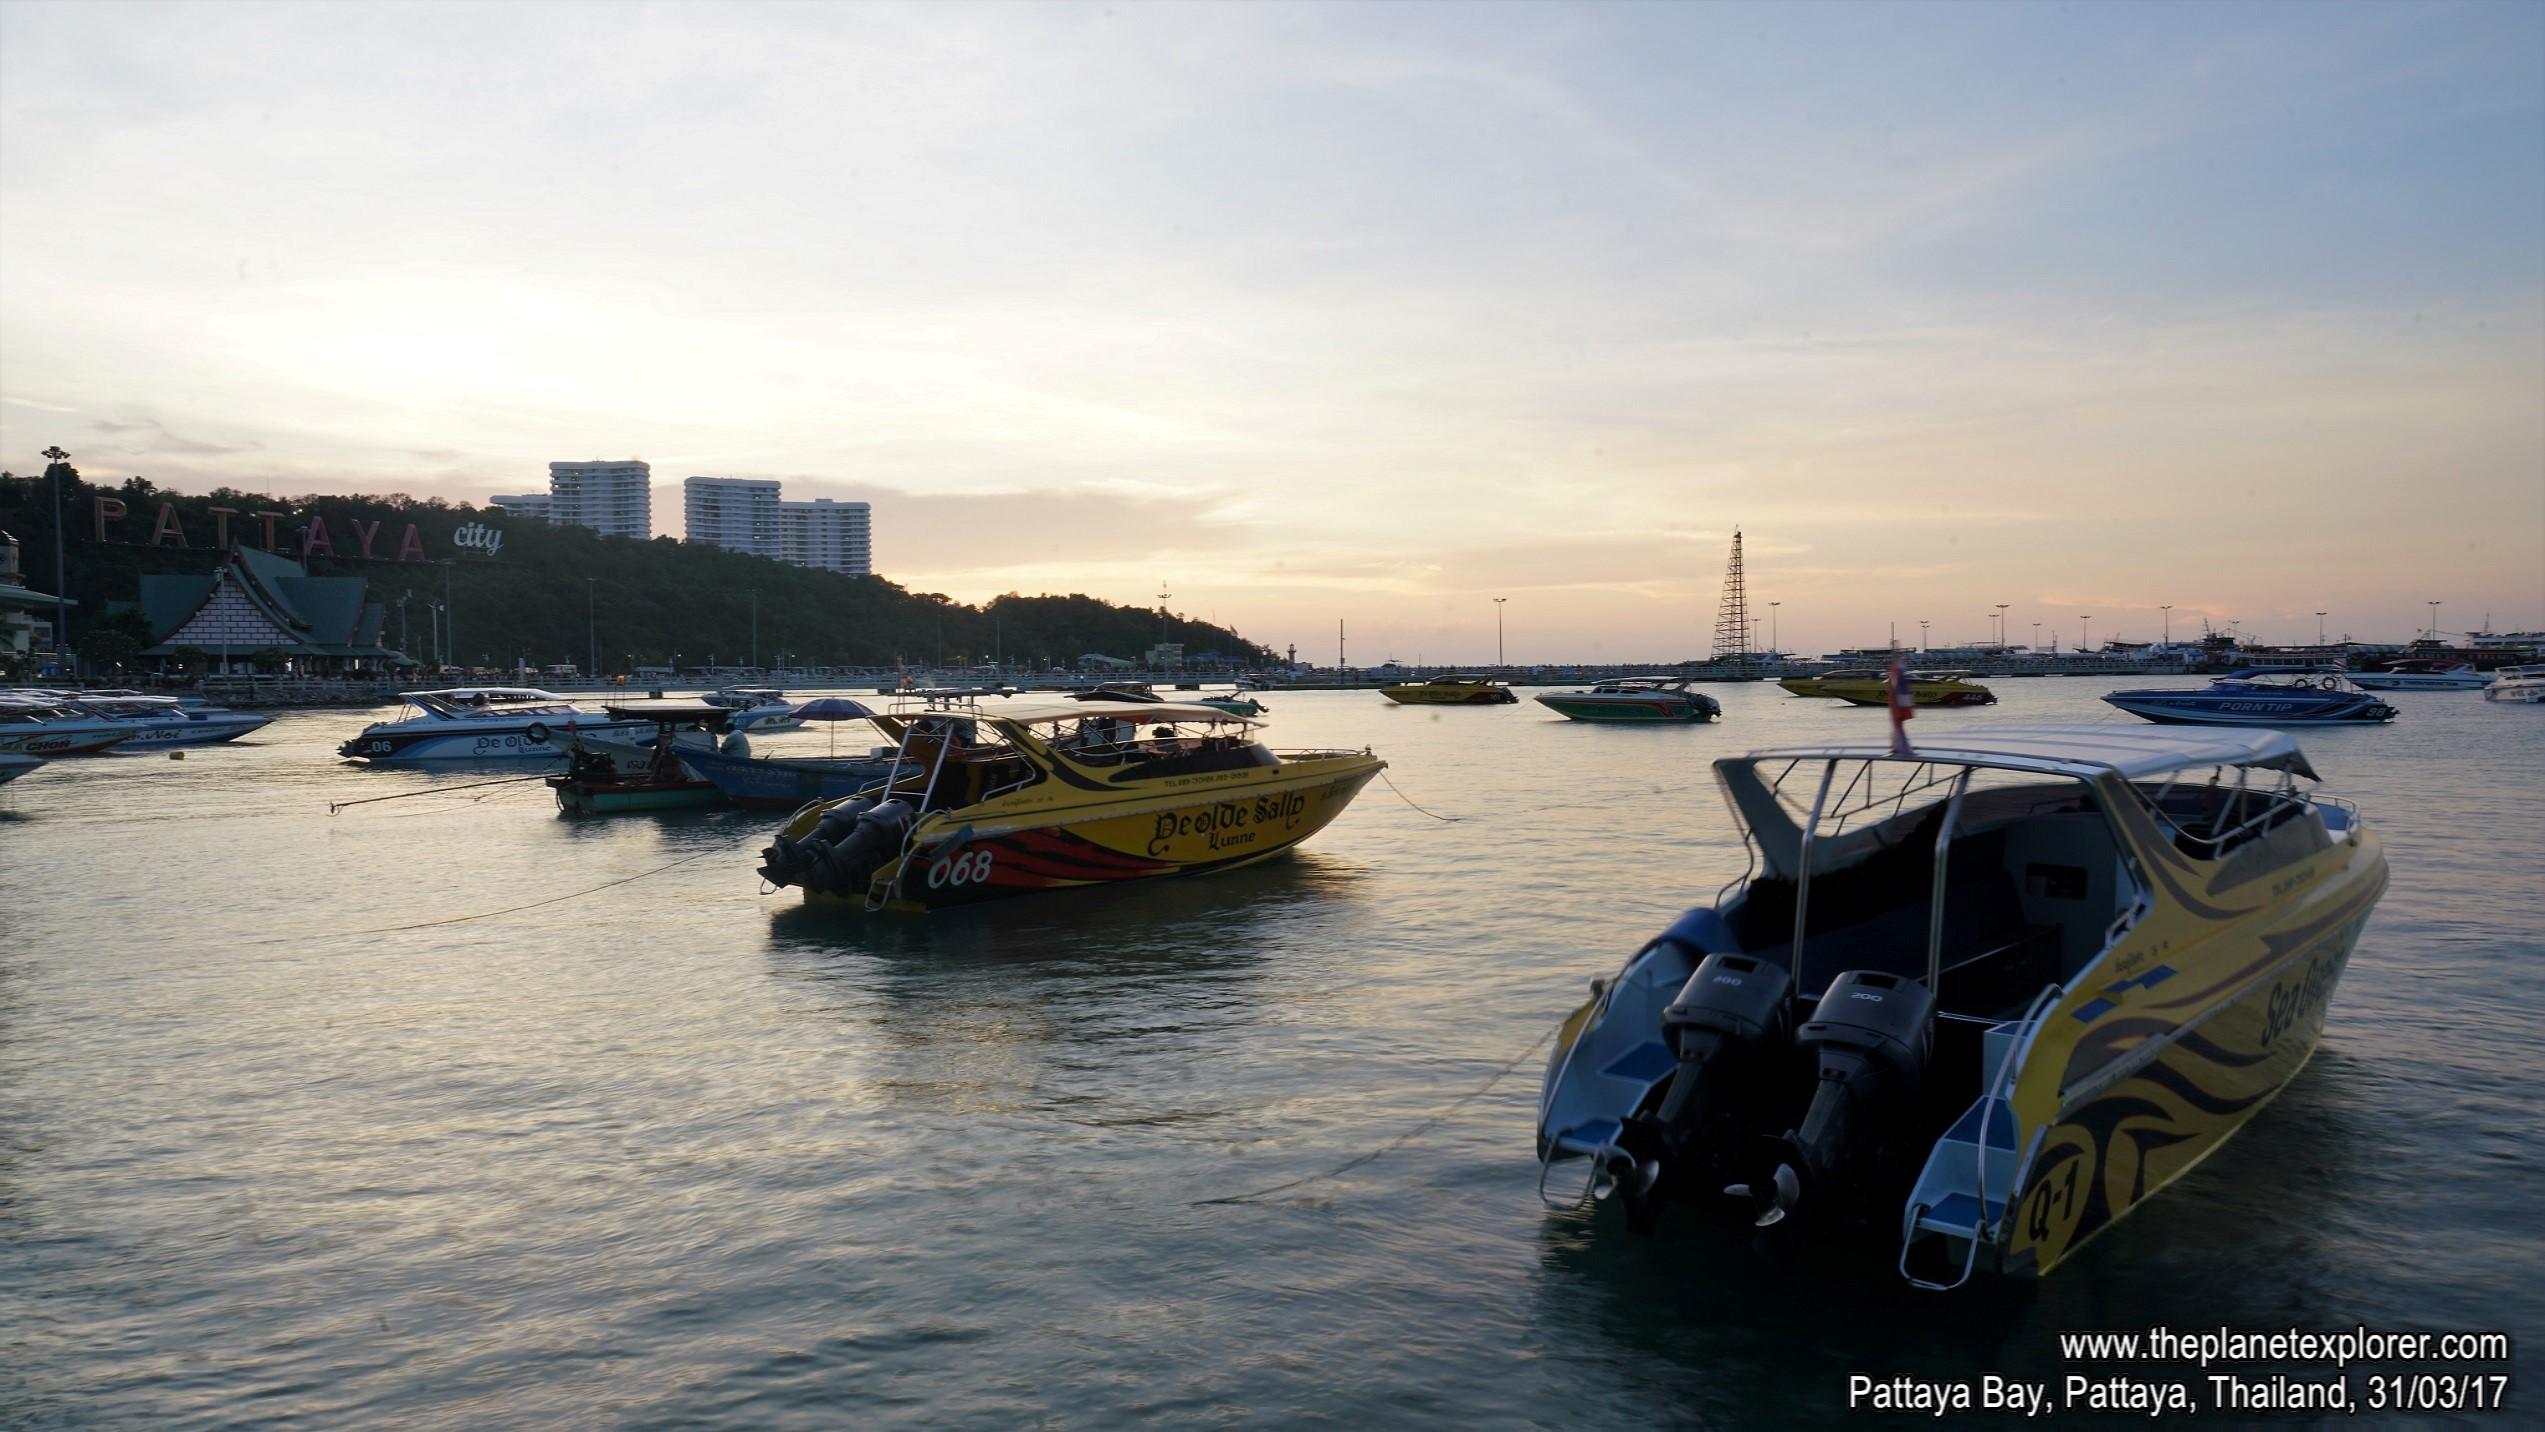 2017-03-31_1822_Thailand_Pattaya_Pattaya Beach_DSC04032_s7R2_LR_@